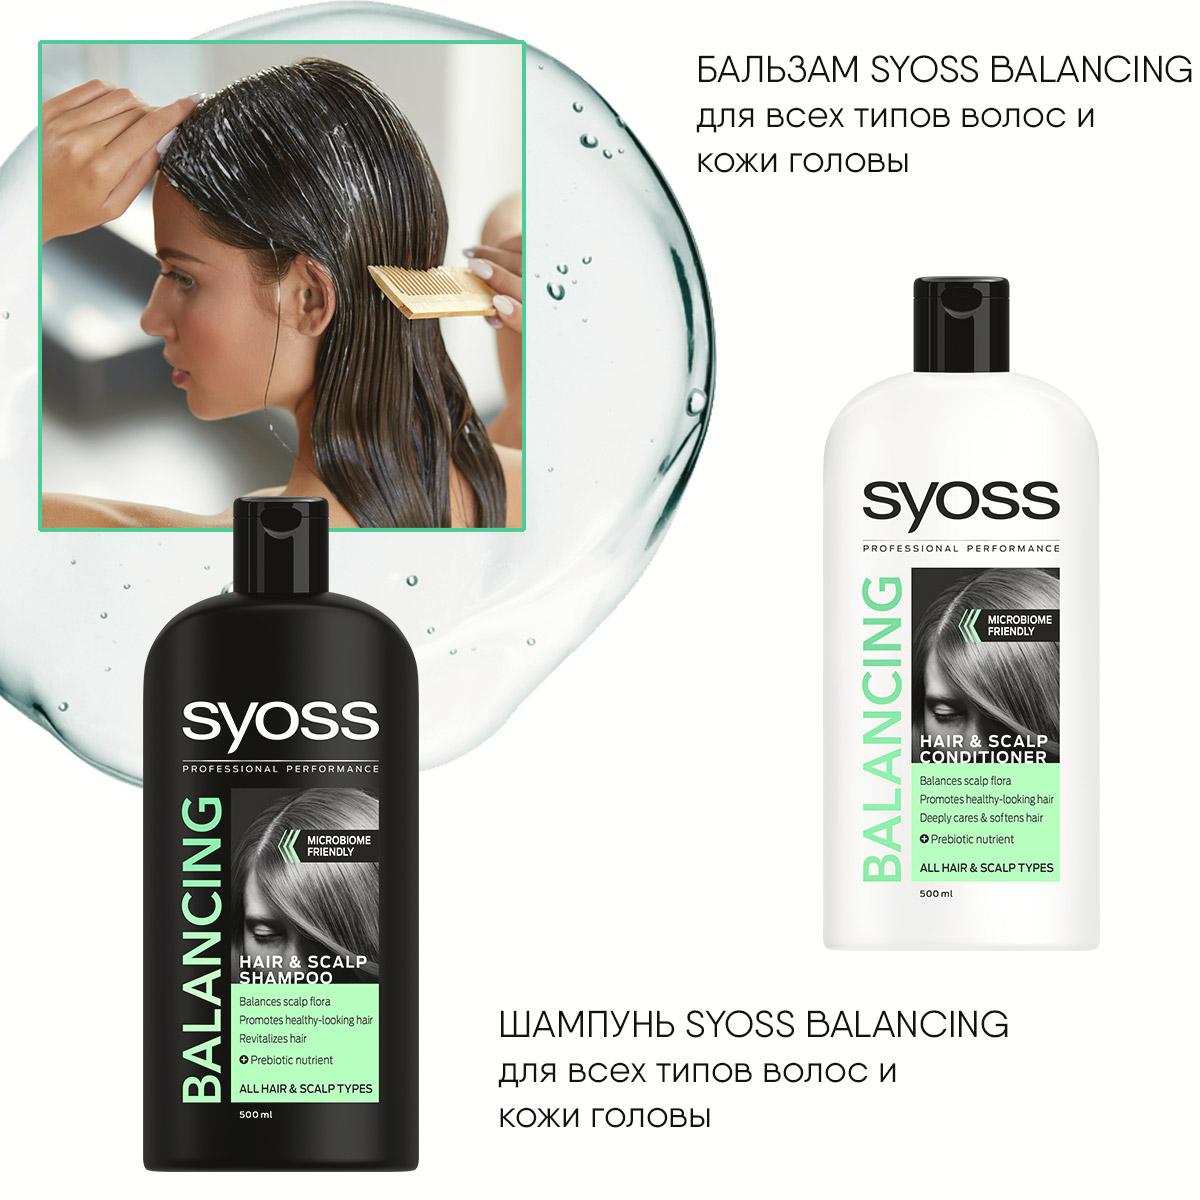 Уход за волосами с брендом Syoss